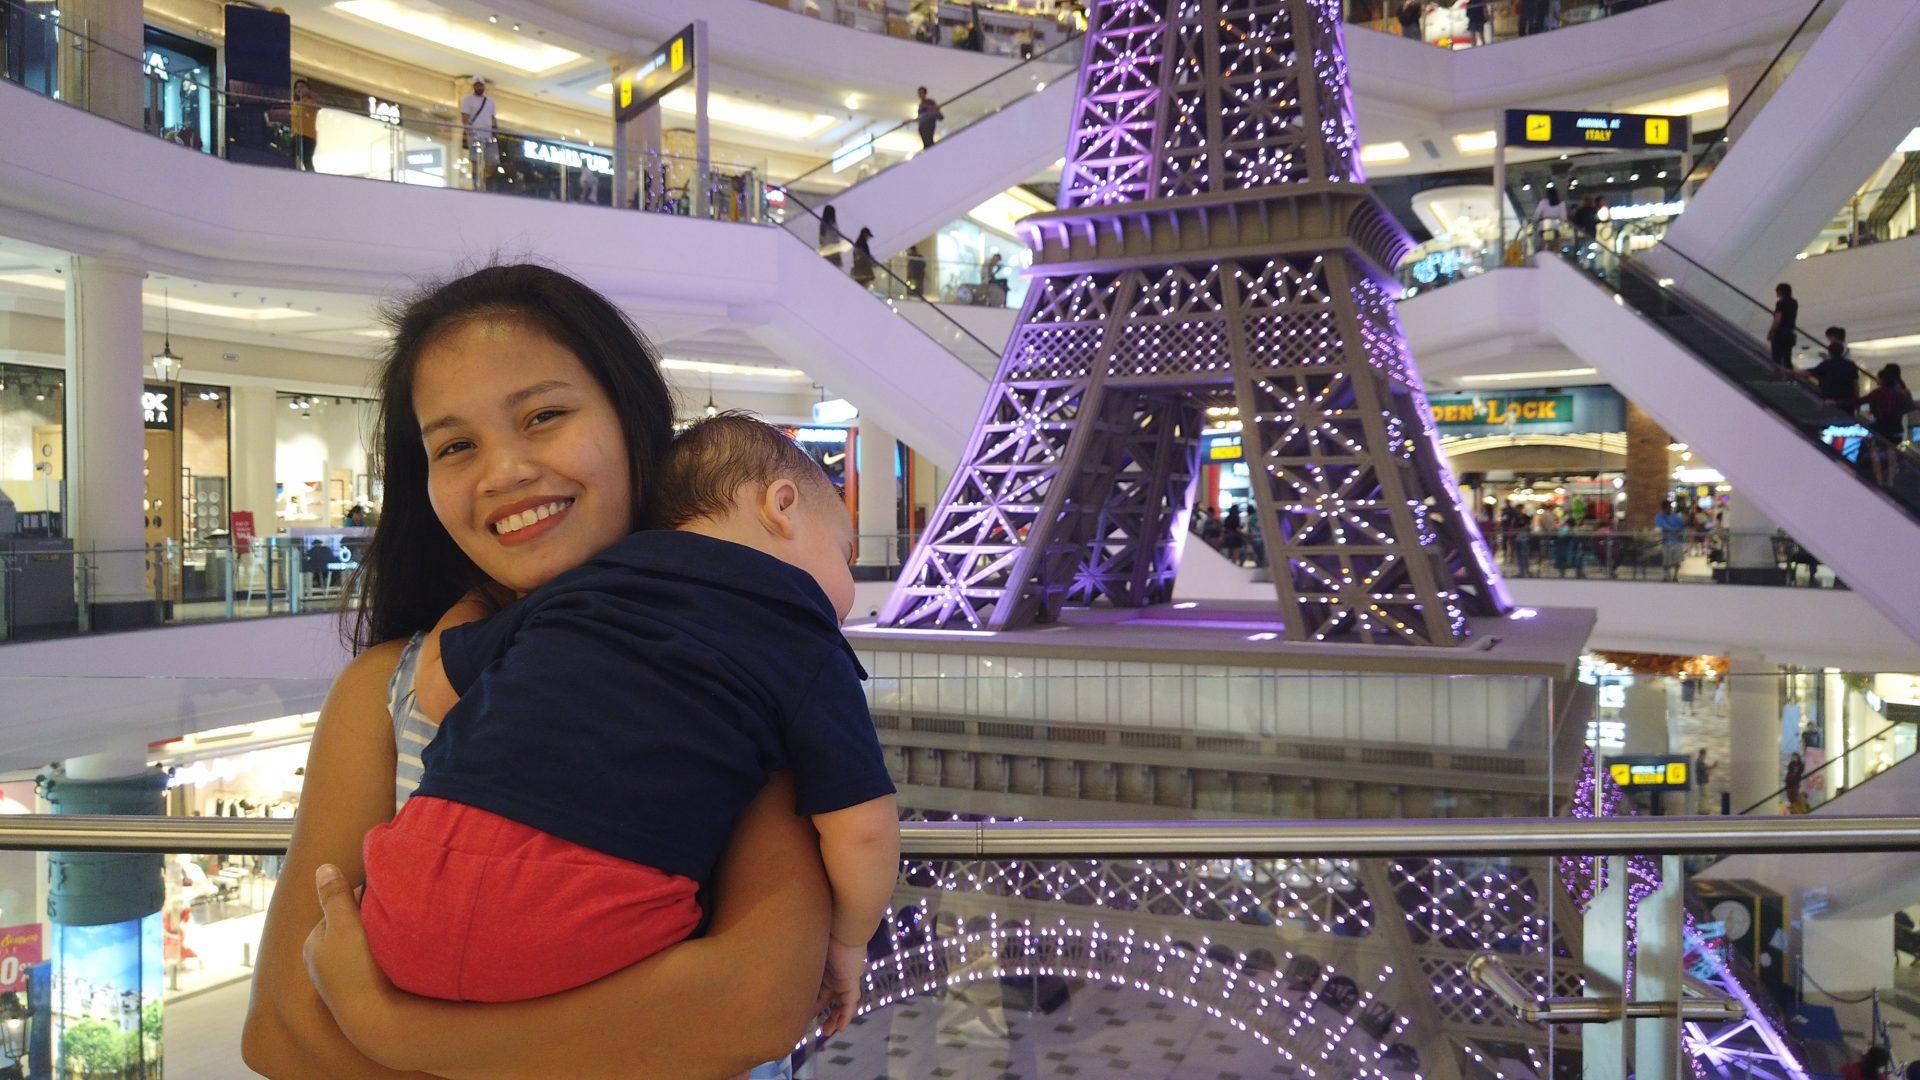 Terminal 21 Shopping Mall Pattaya, Thailand